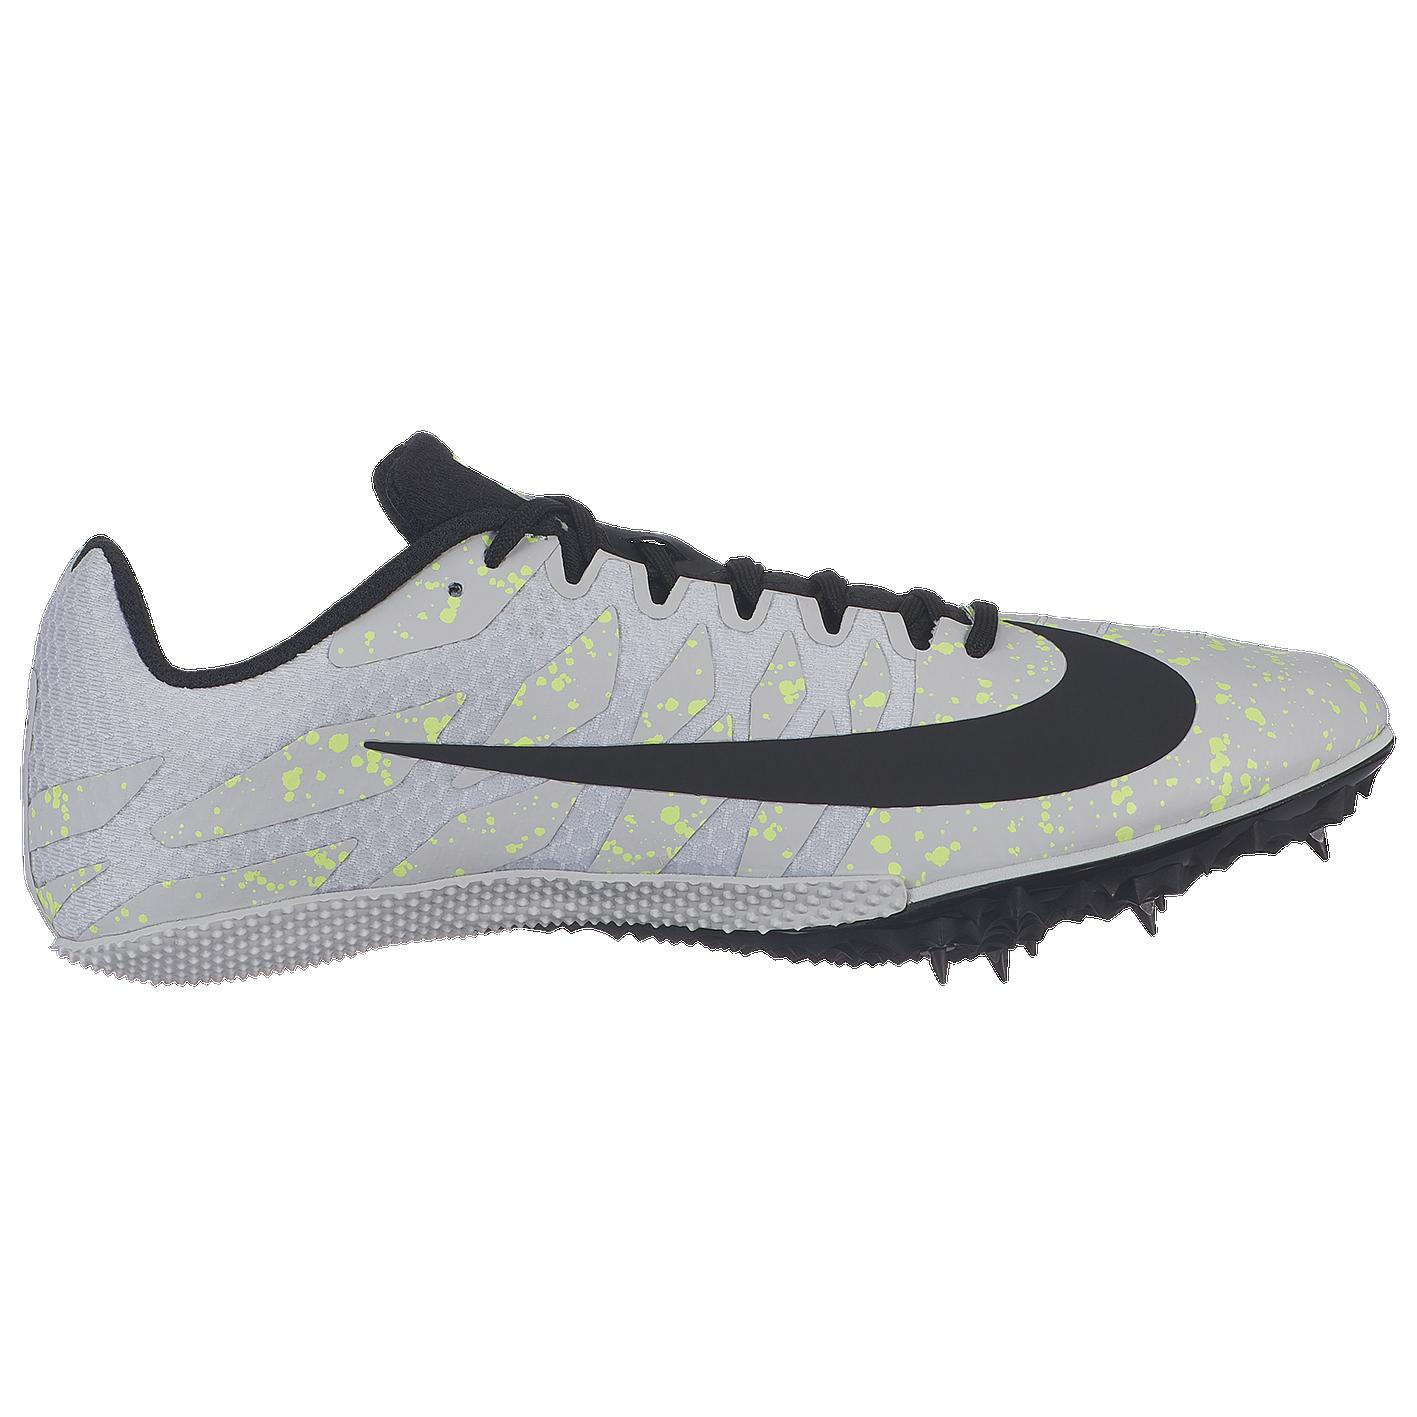 5447d39d326f Nike Zoom Rival S 9 - Boys' Grade School - Track & Field - Shoes ...